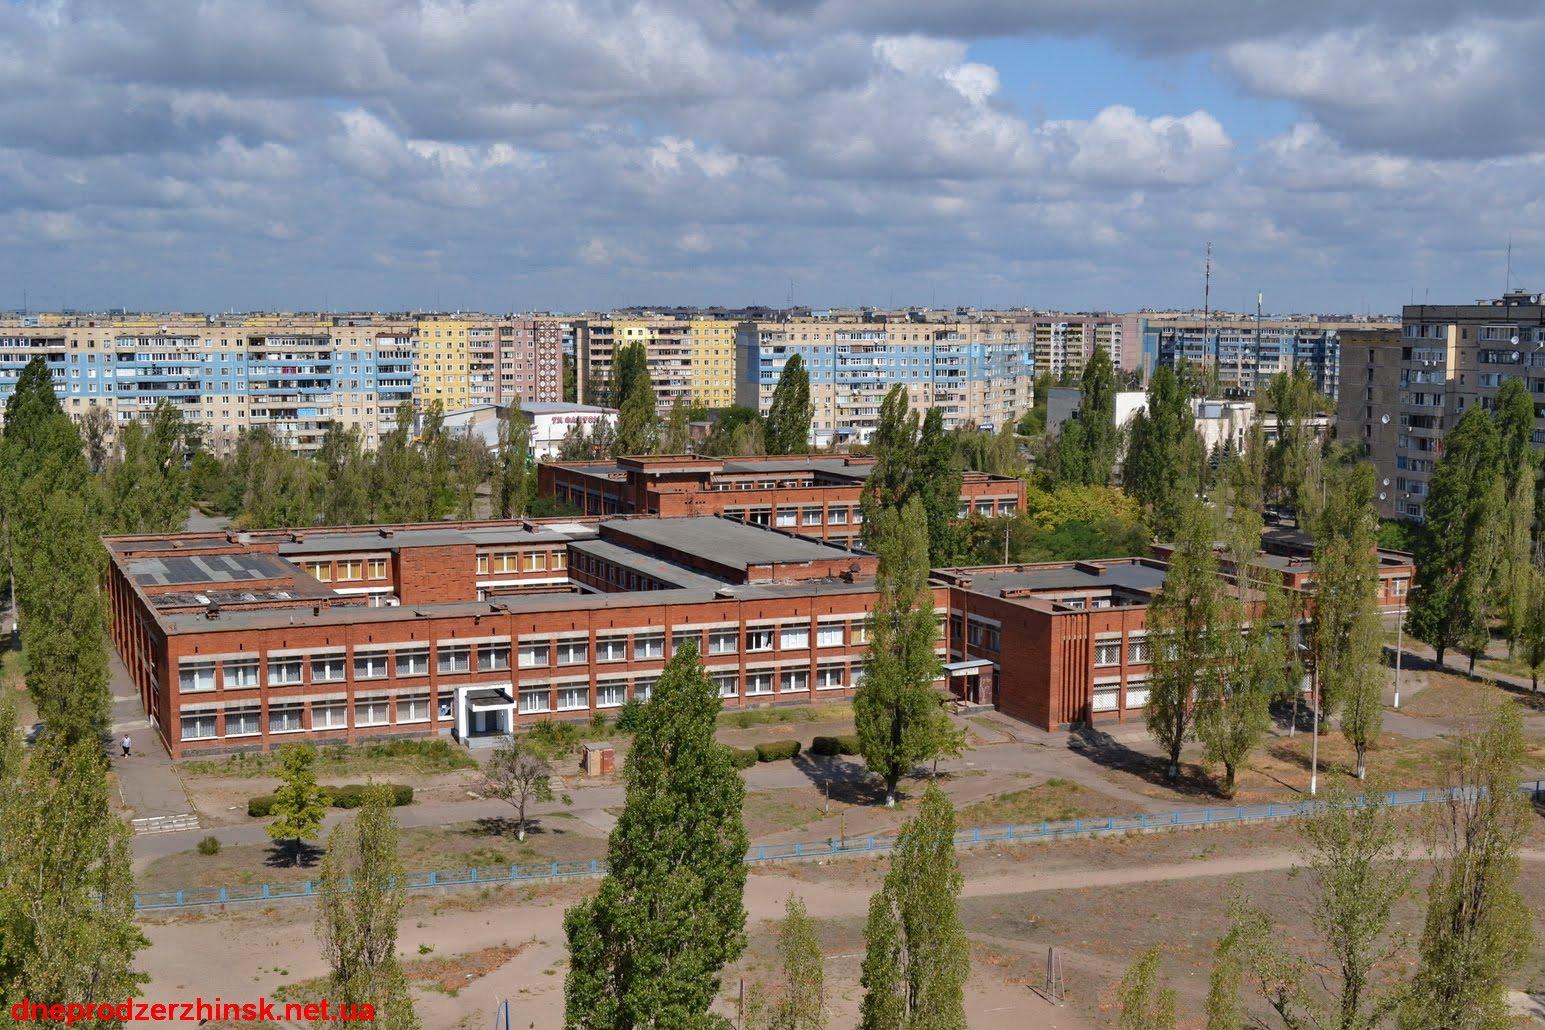 фото 36 школа днепродзержинск